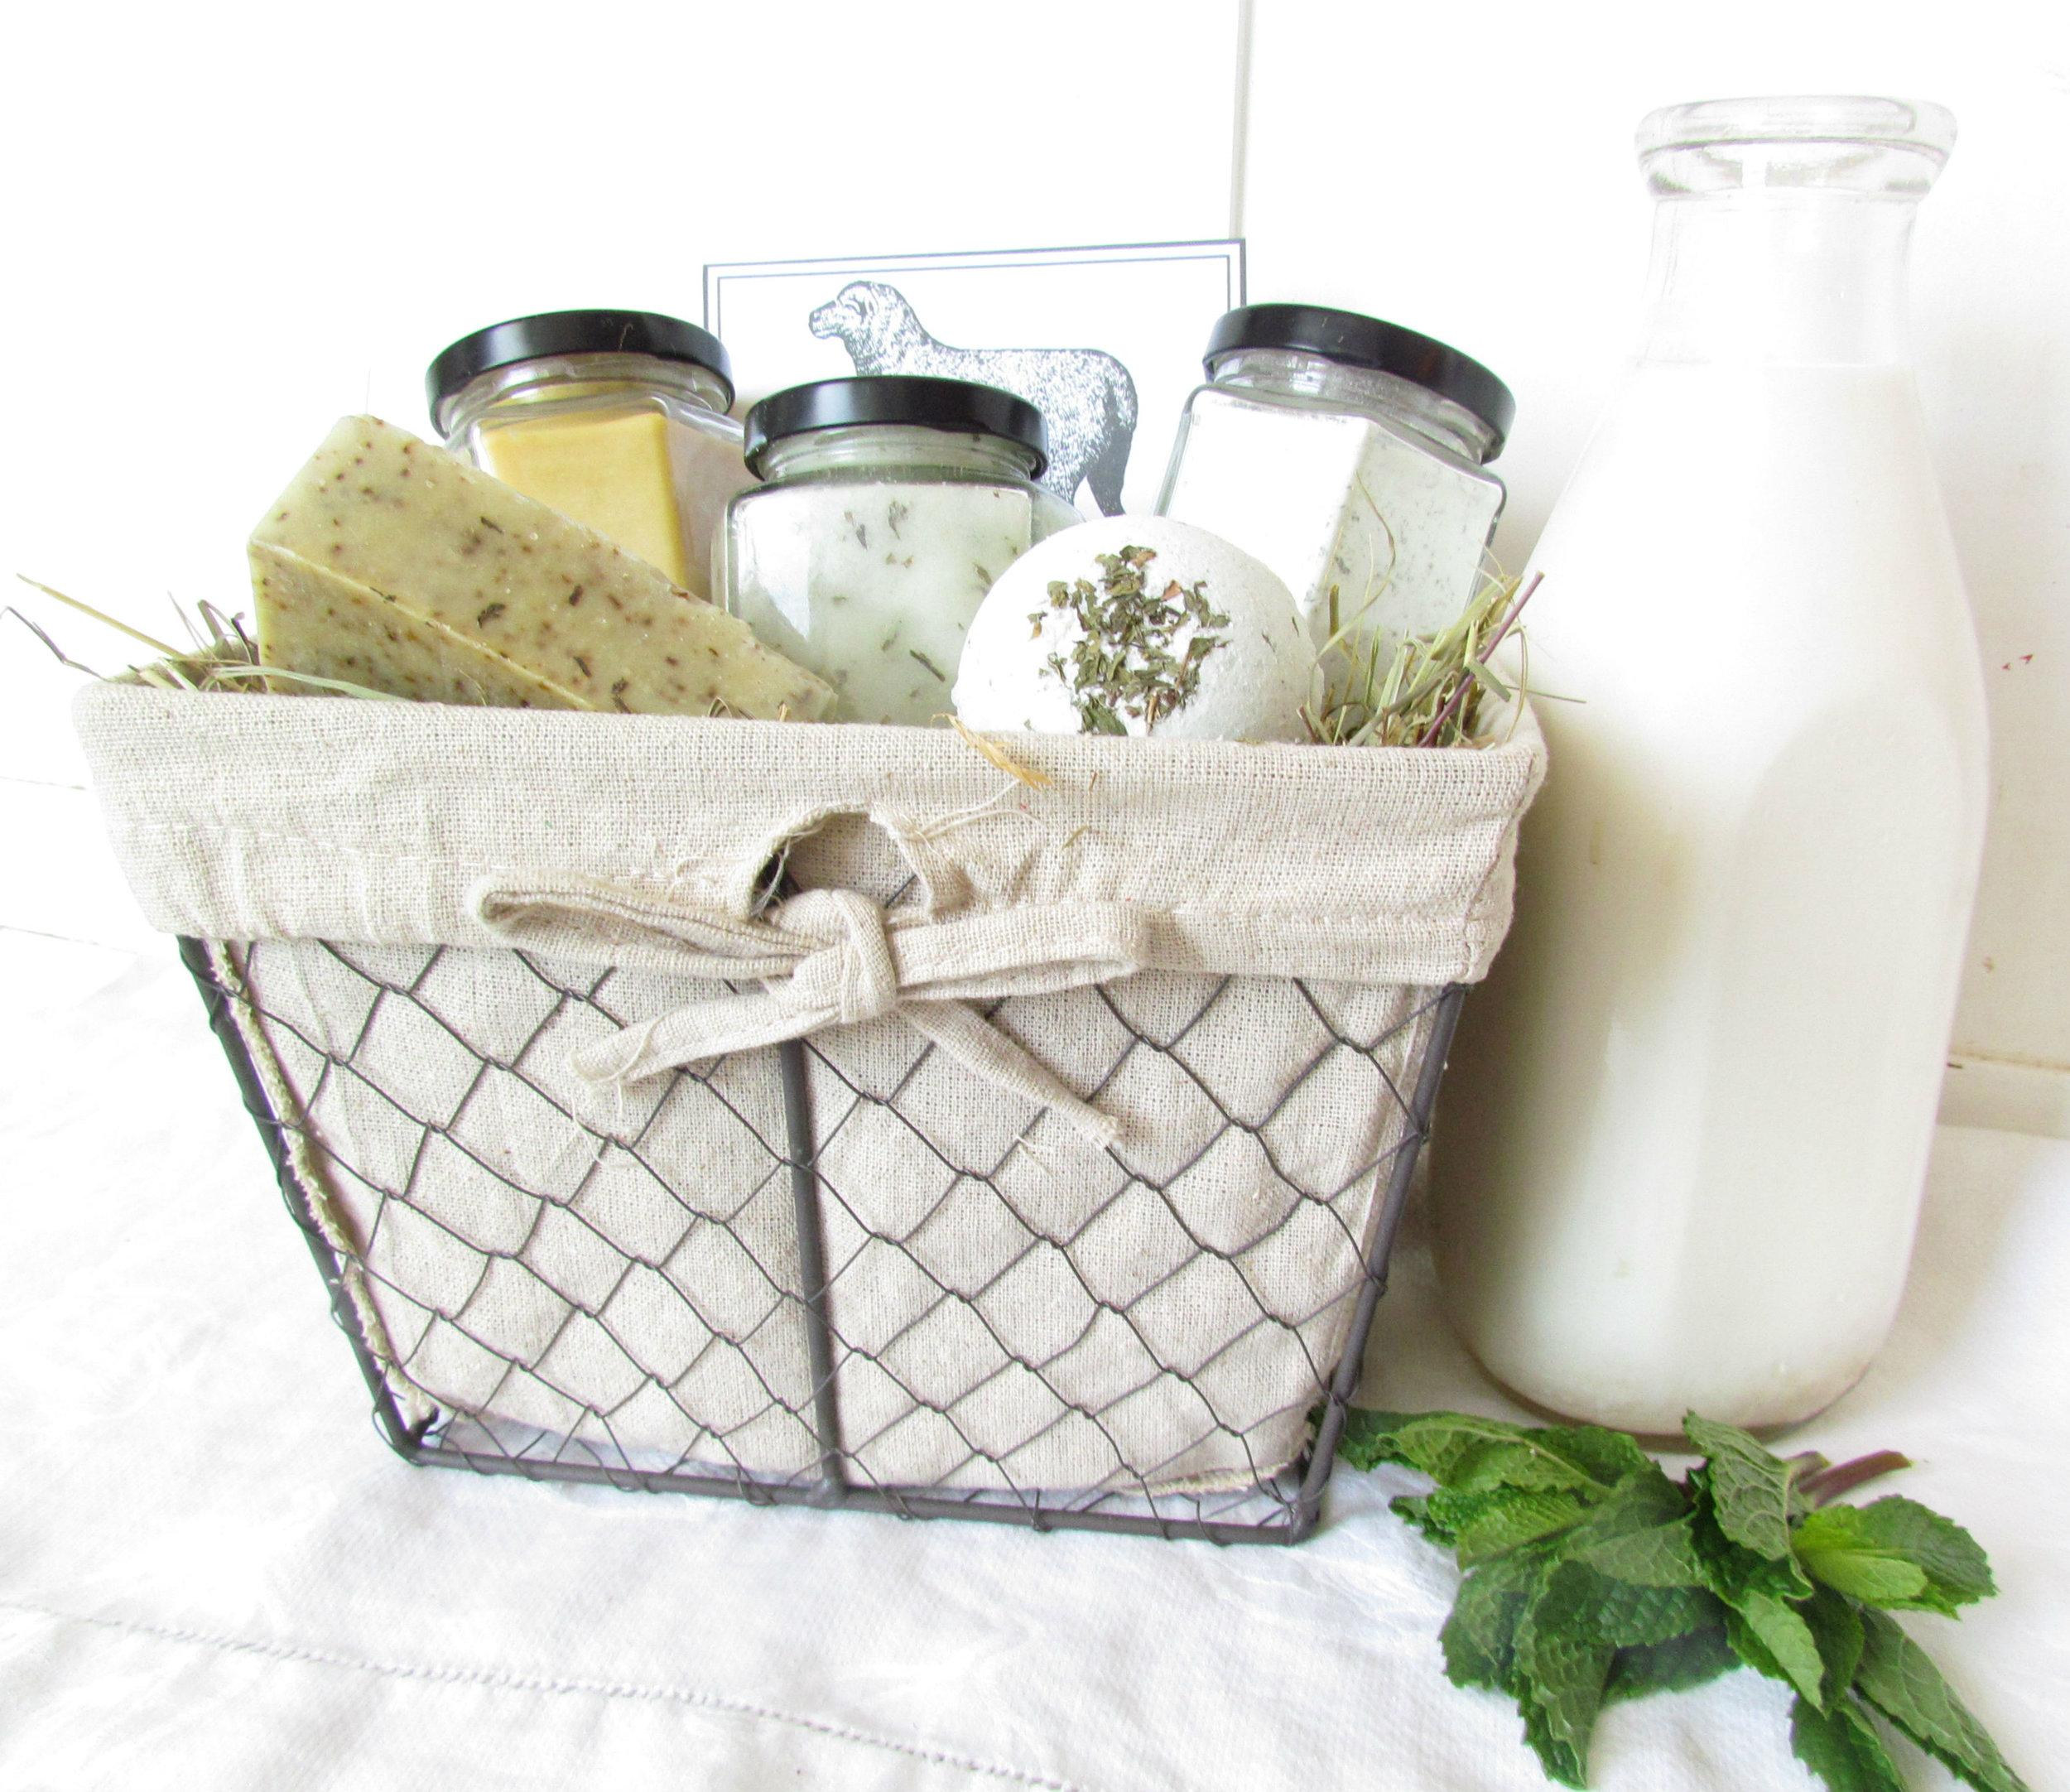 Refreshing garden spearmint sheep milk gift basket